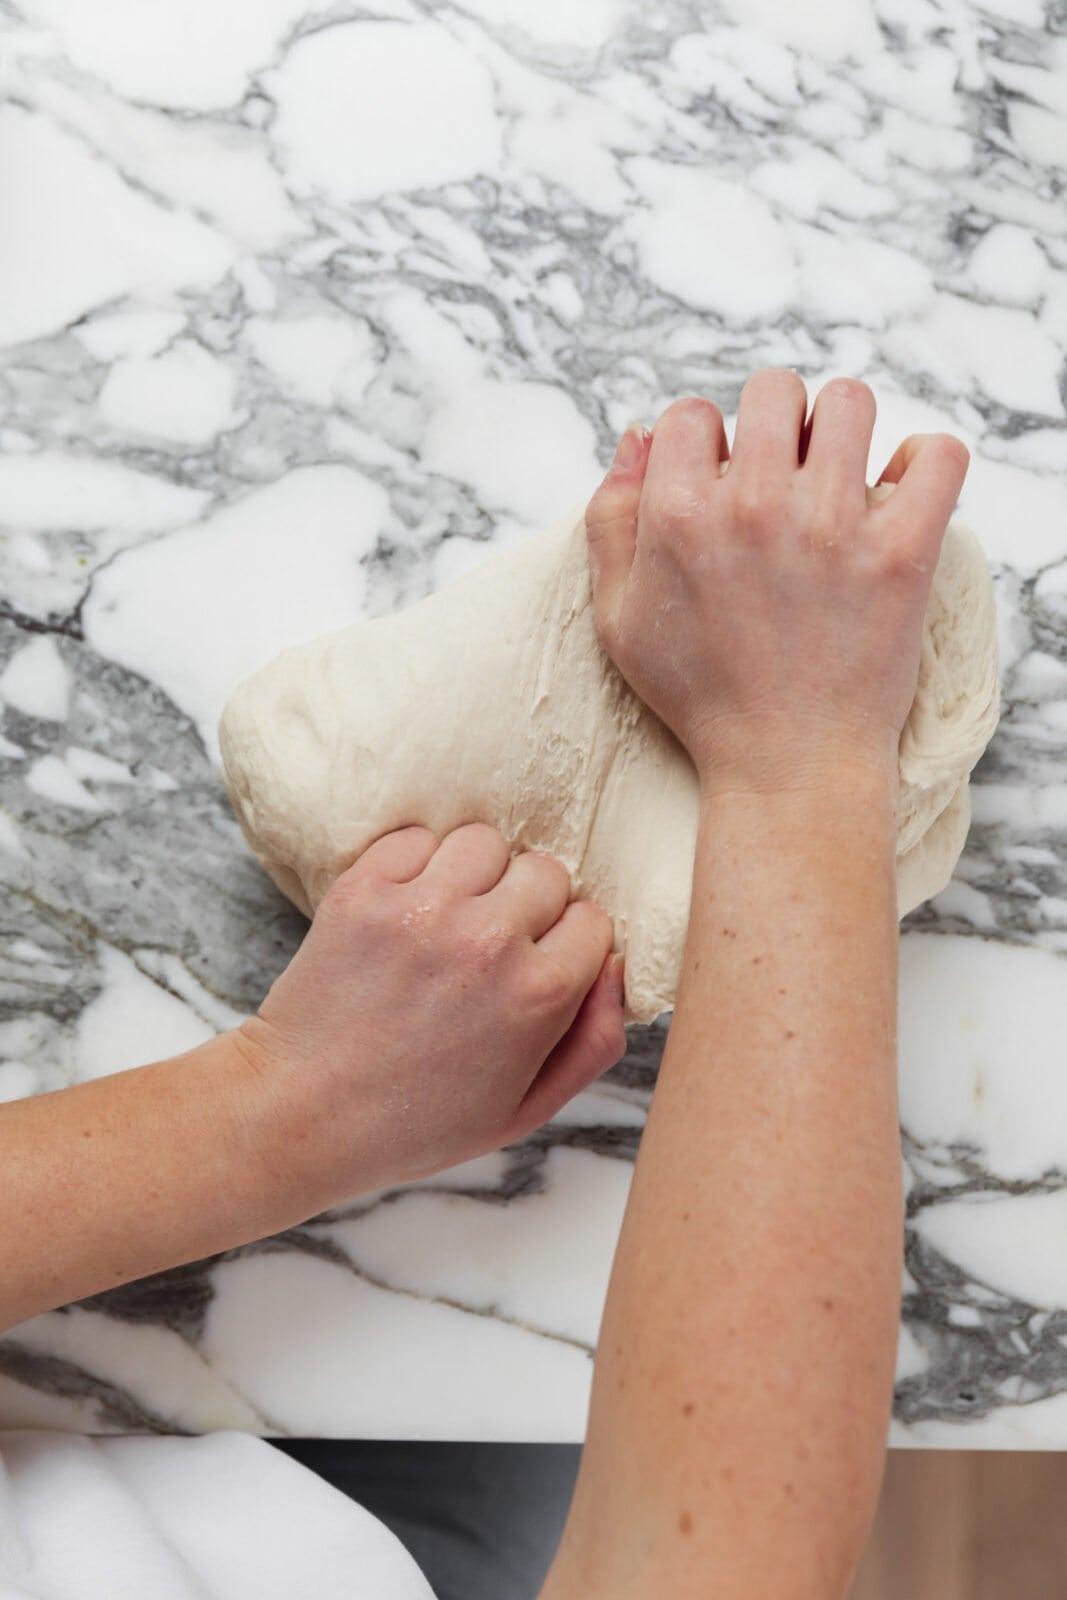 kneading bagel dough